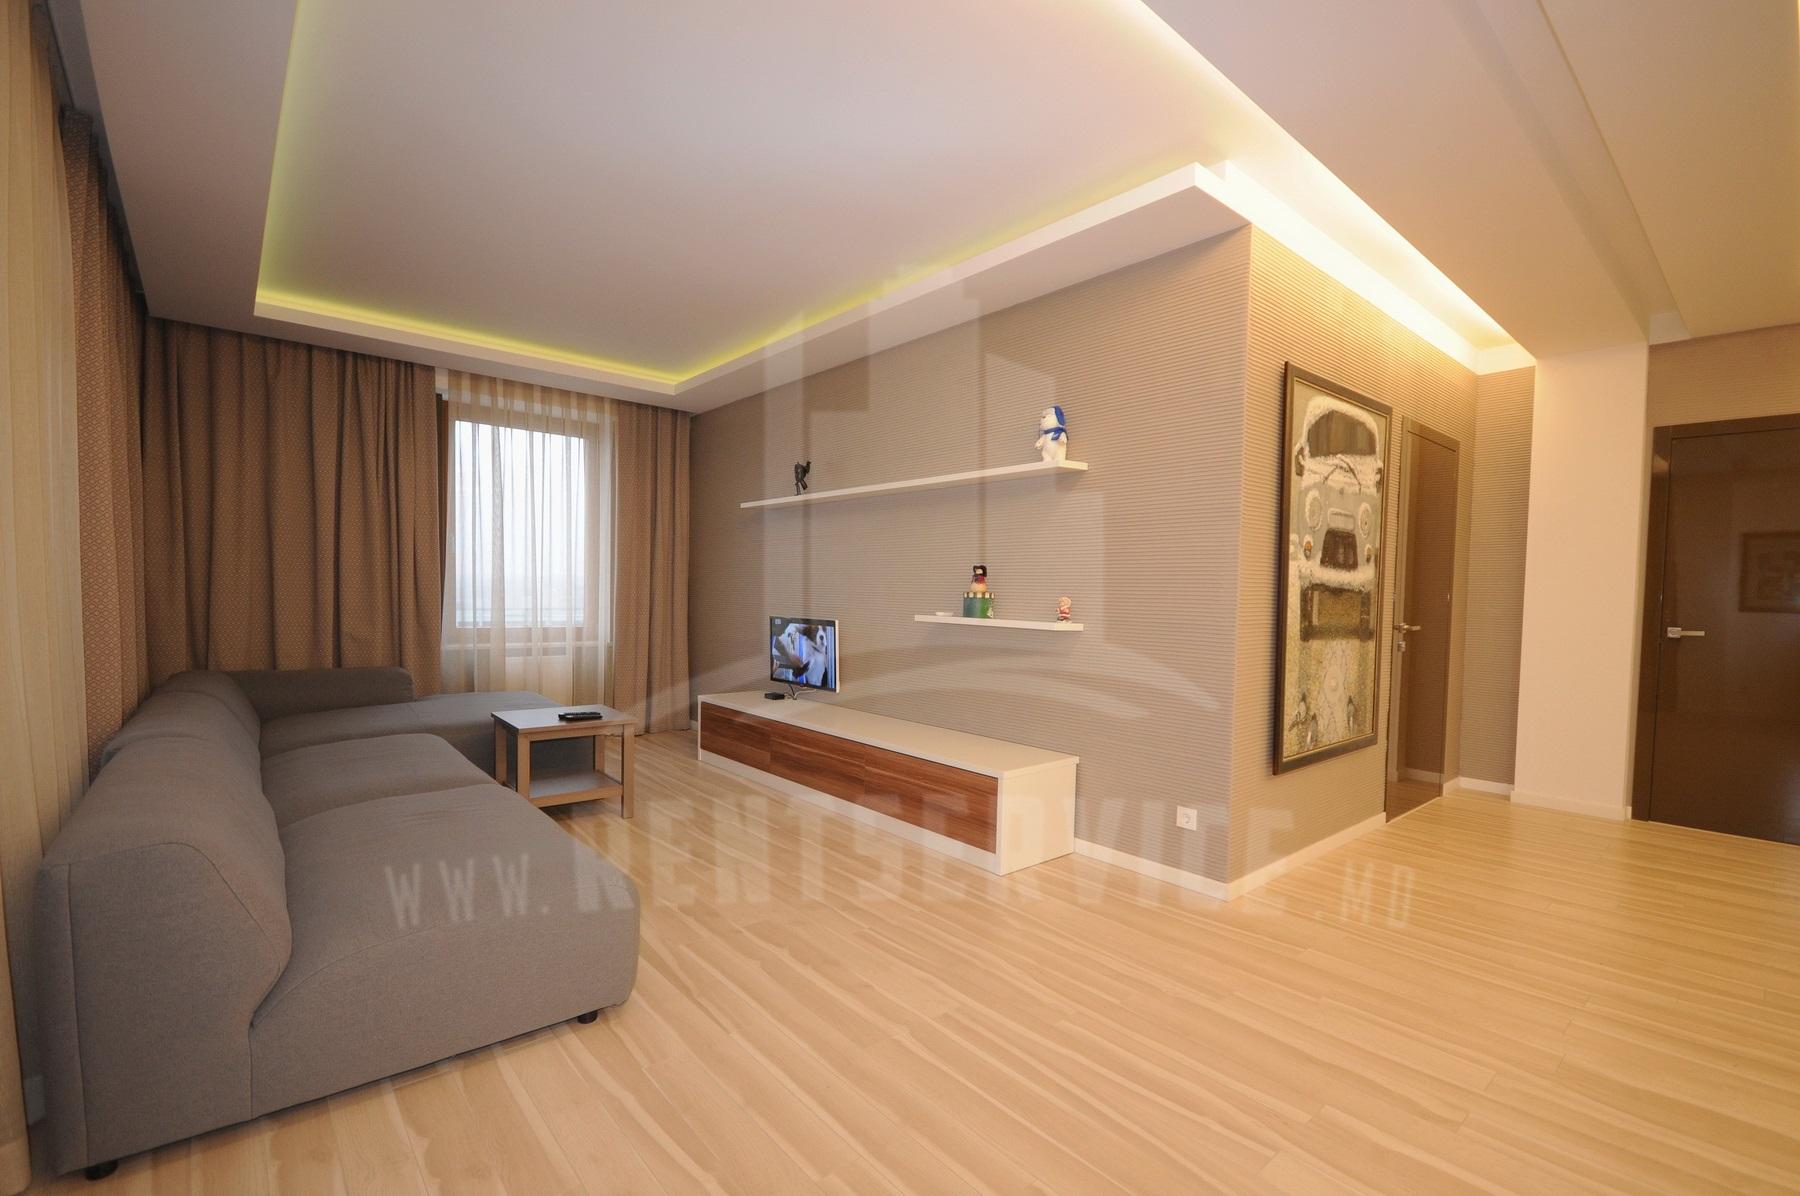 2060_apartment_13.JPG